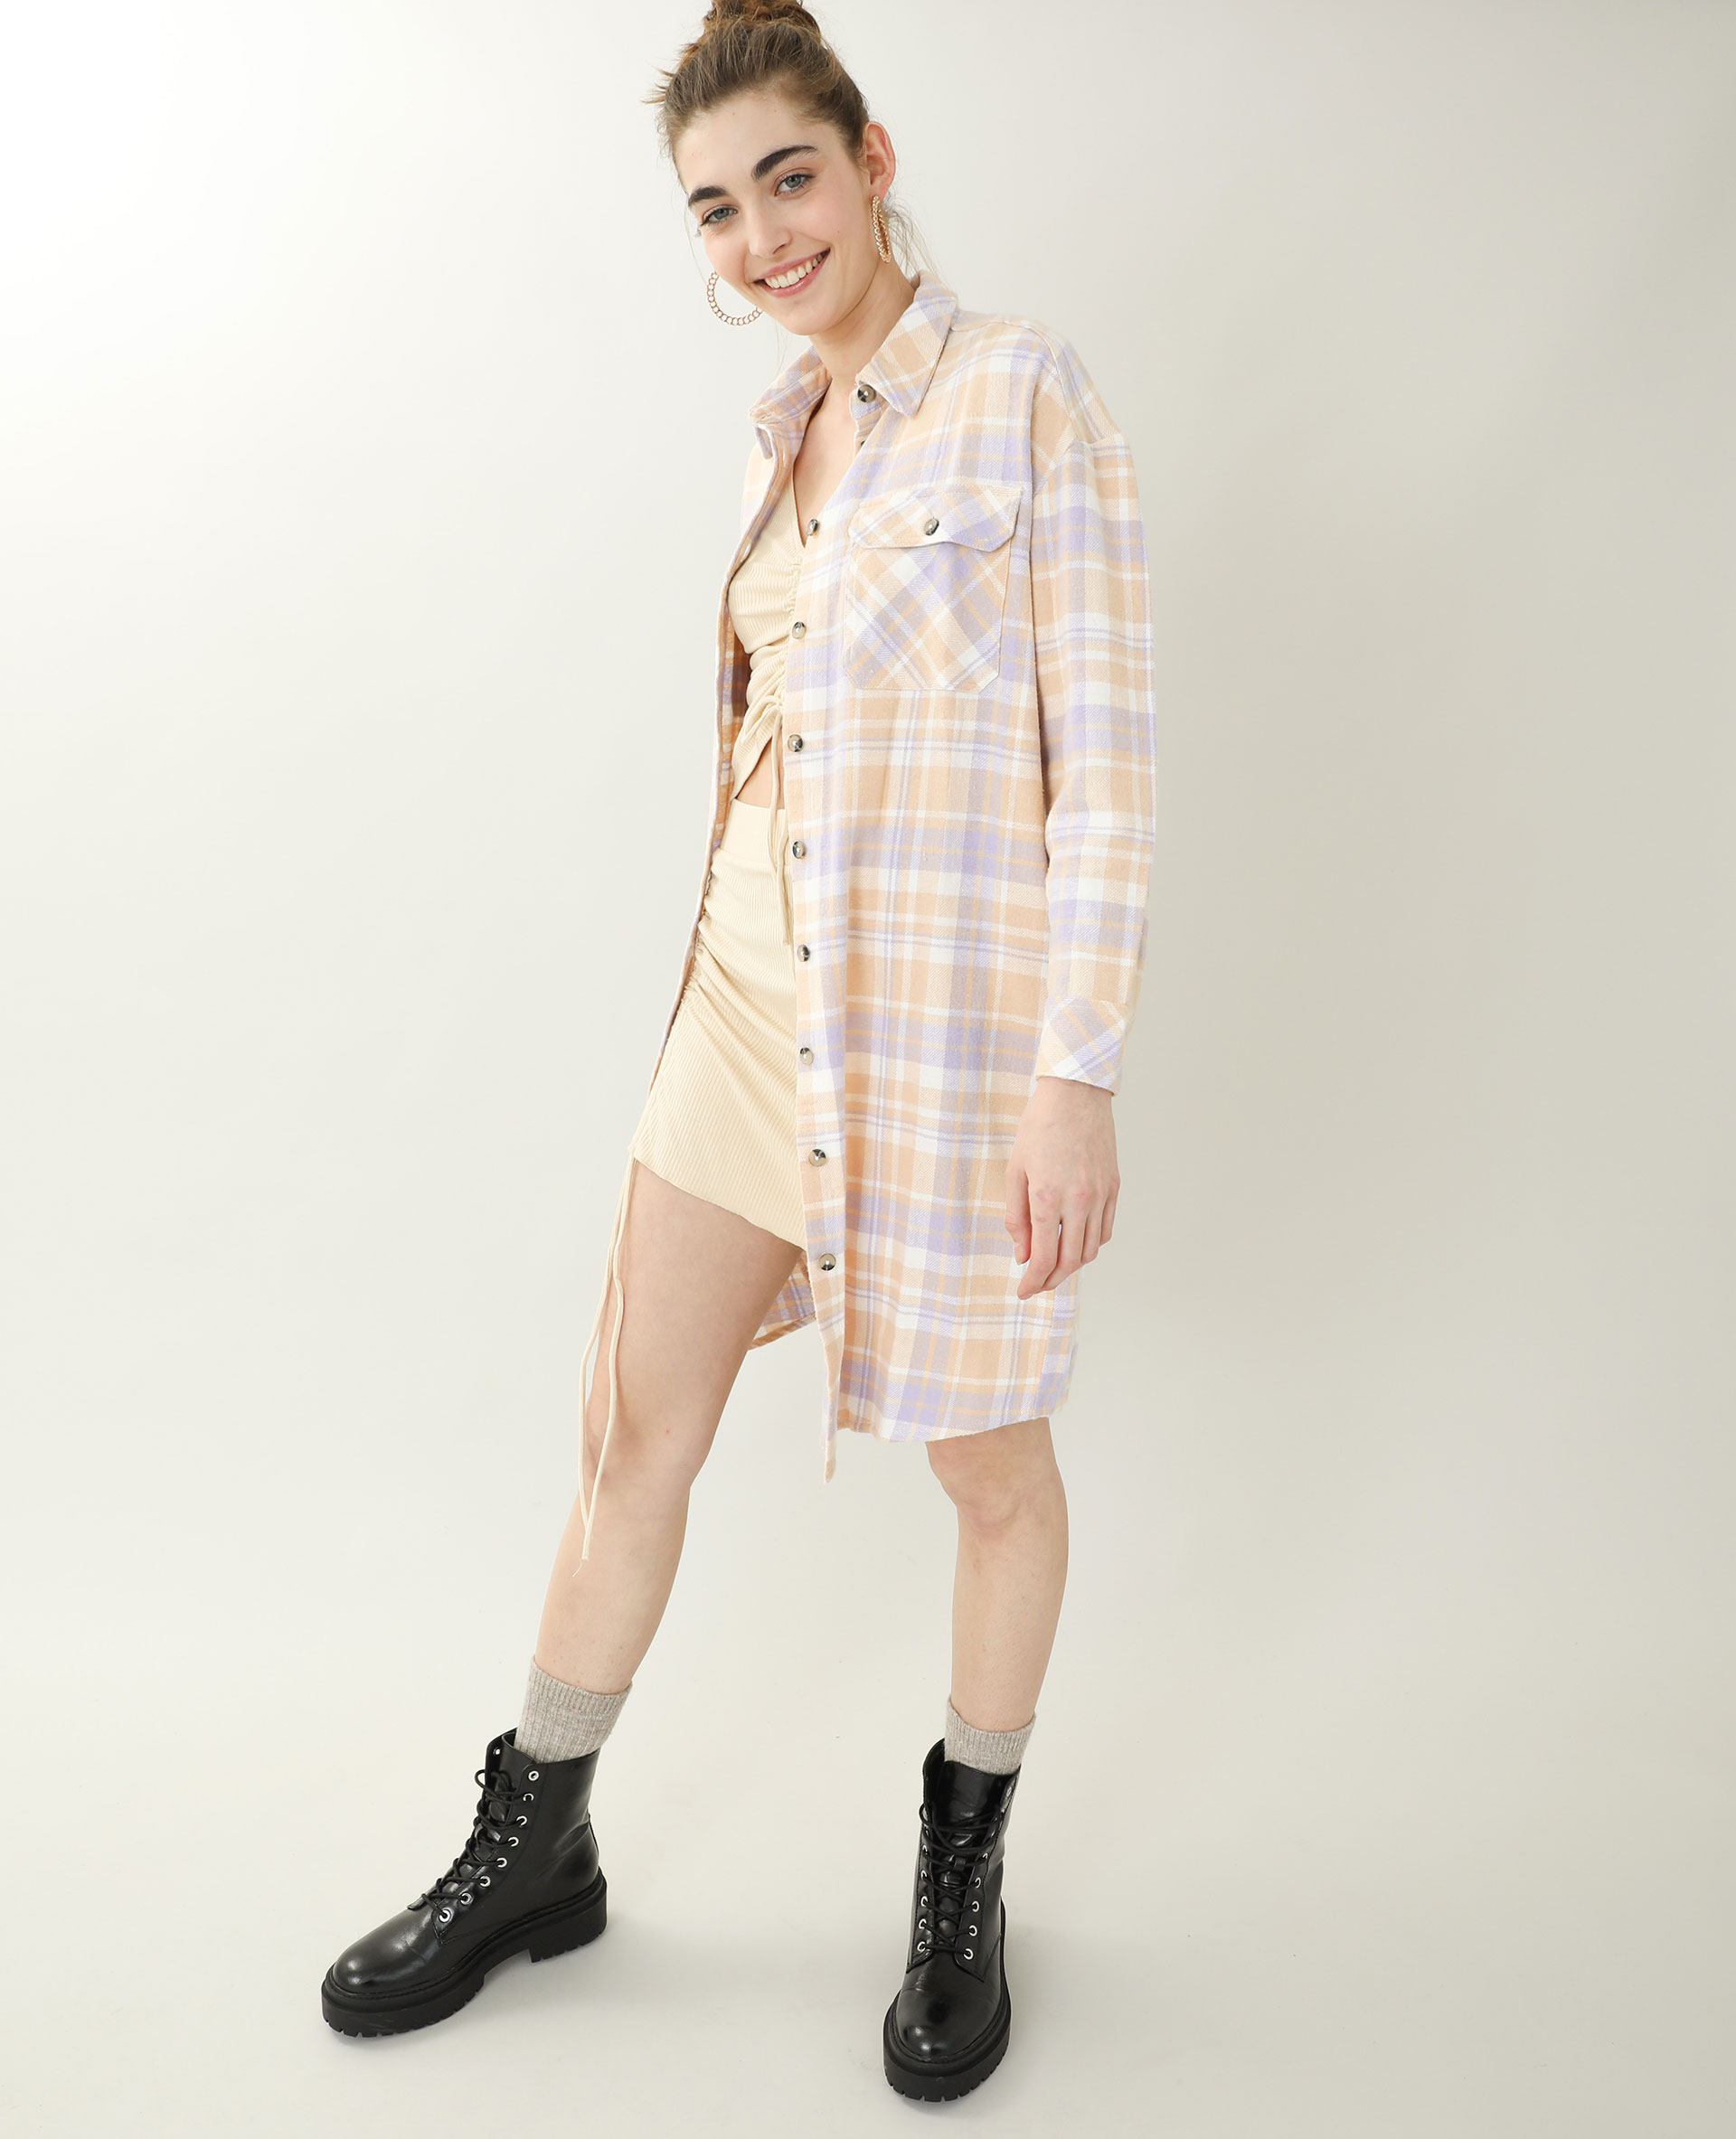 Jupe courte côtelée beige - Pimkie